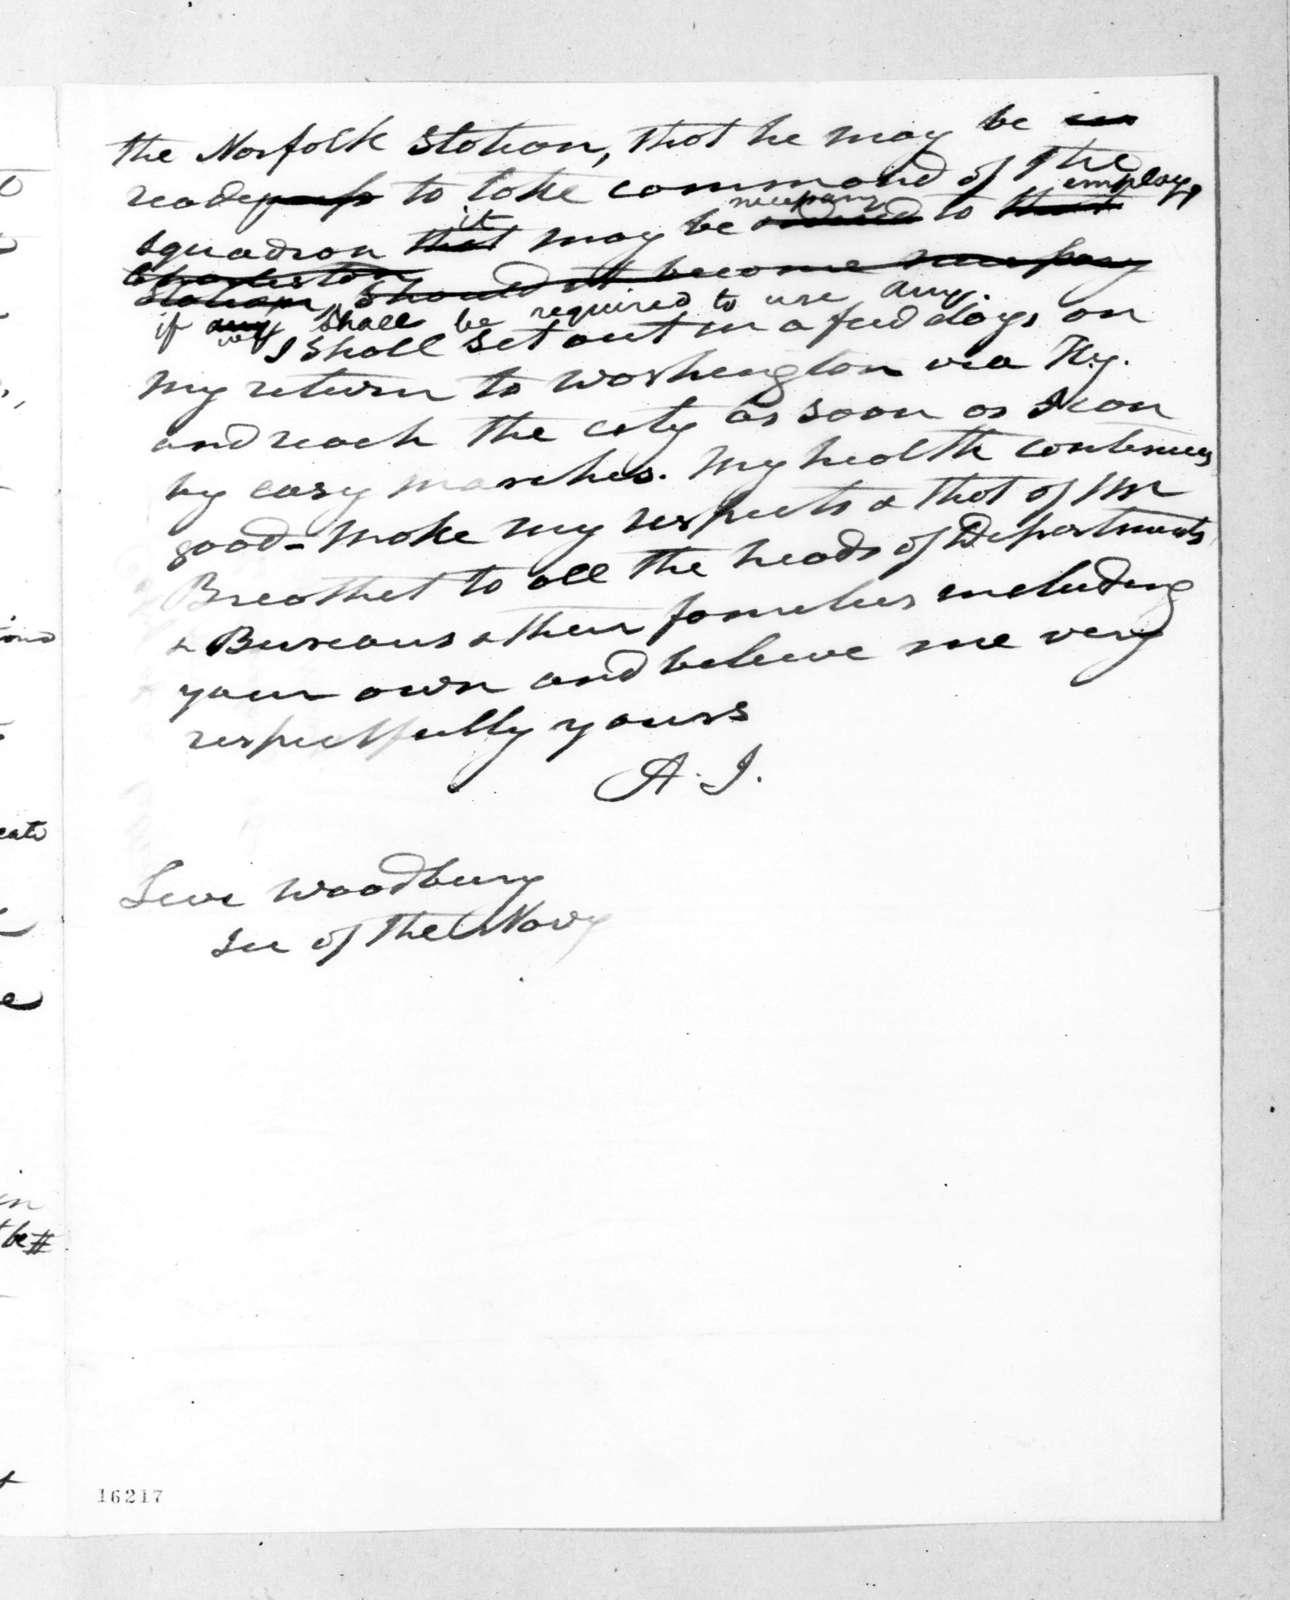 Andrew Jackson to Levi Woodbury, September 11, 1832